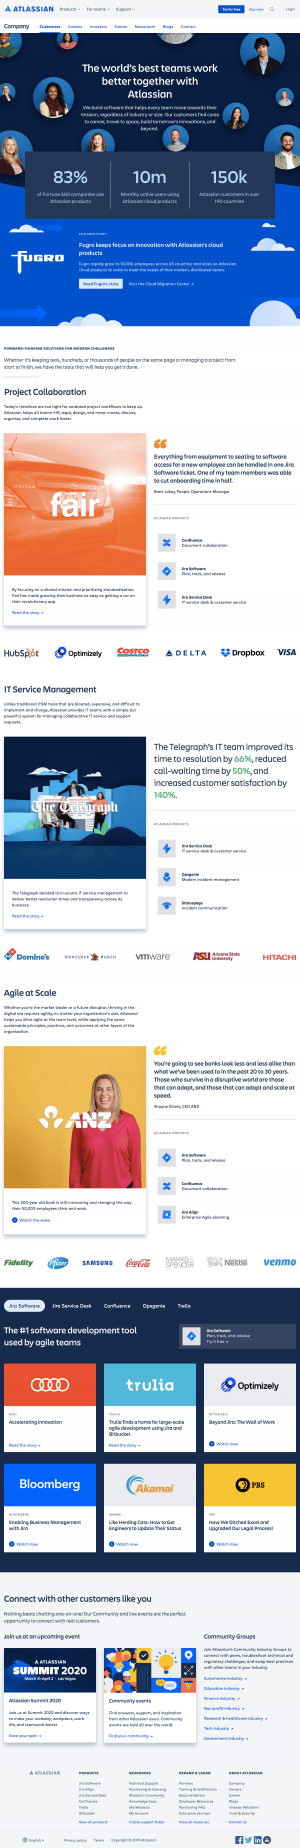 Atlassian - Customers page